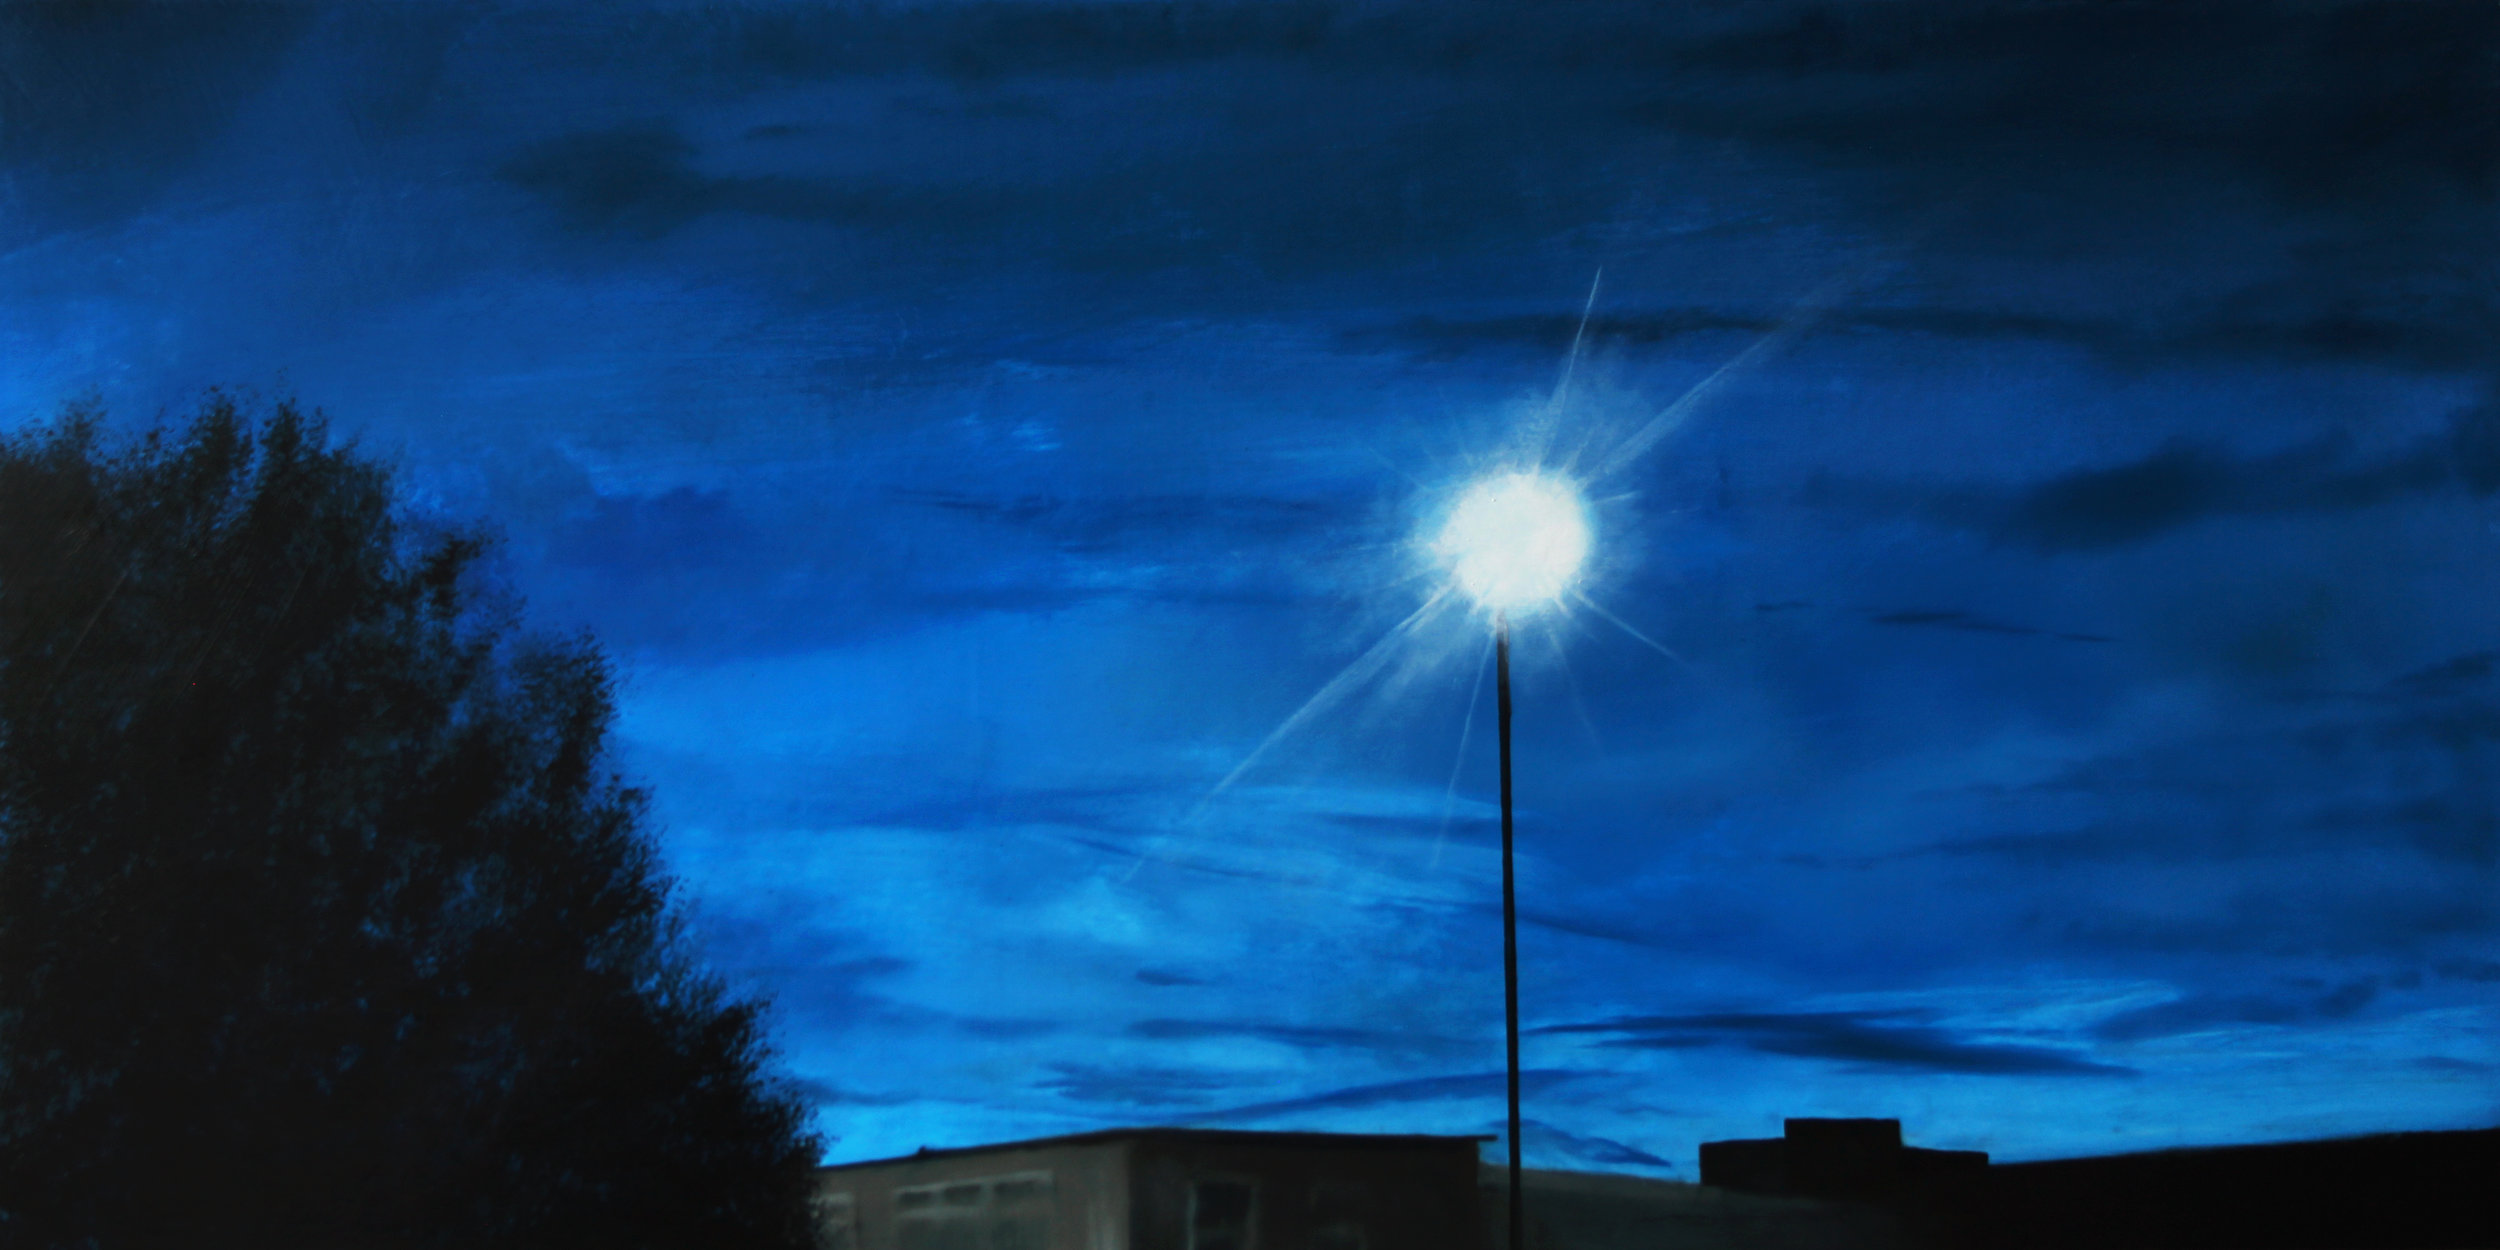 heaton sky  oil on panel  40 x 80 cm  2018  private commission